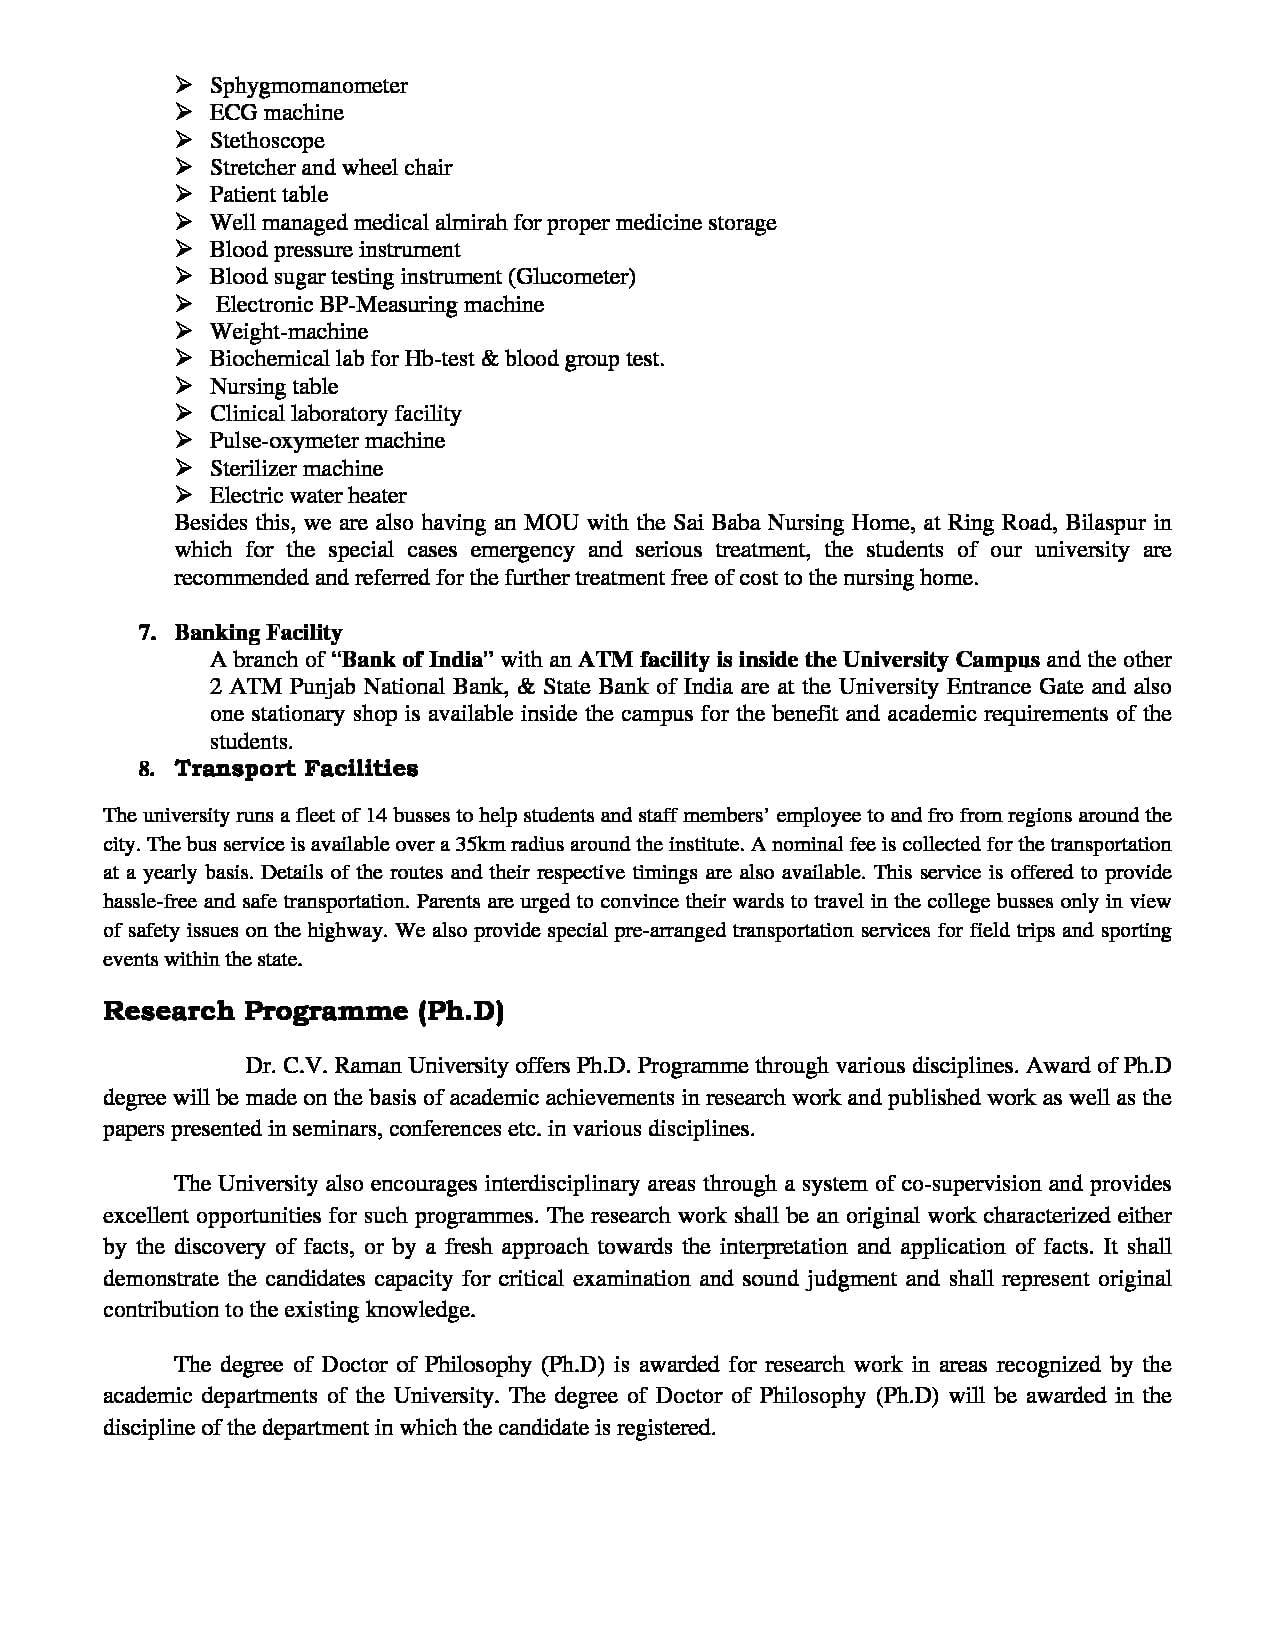 dr  cv raman university  bilaspur